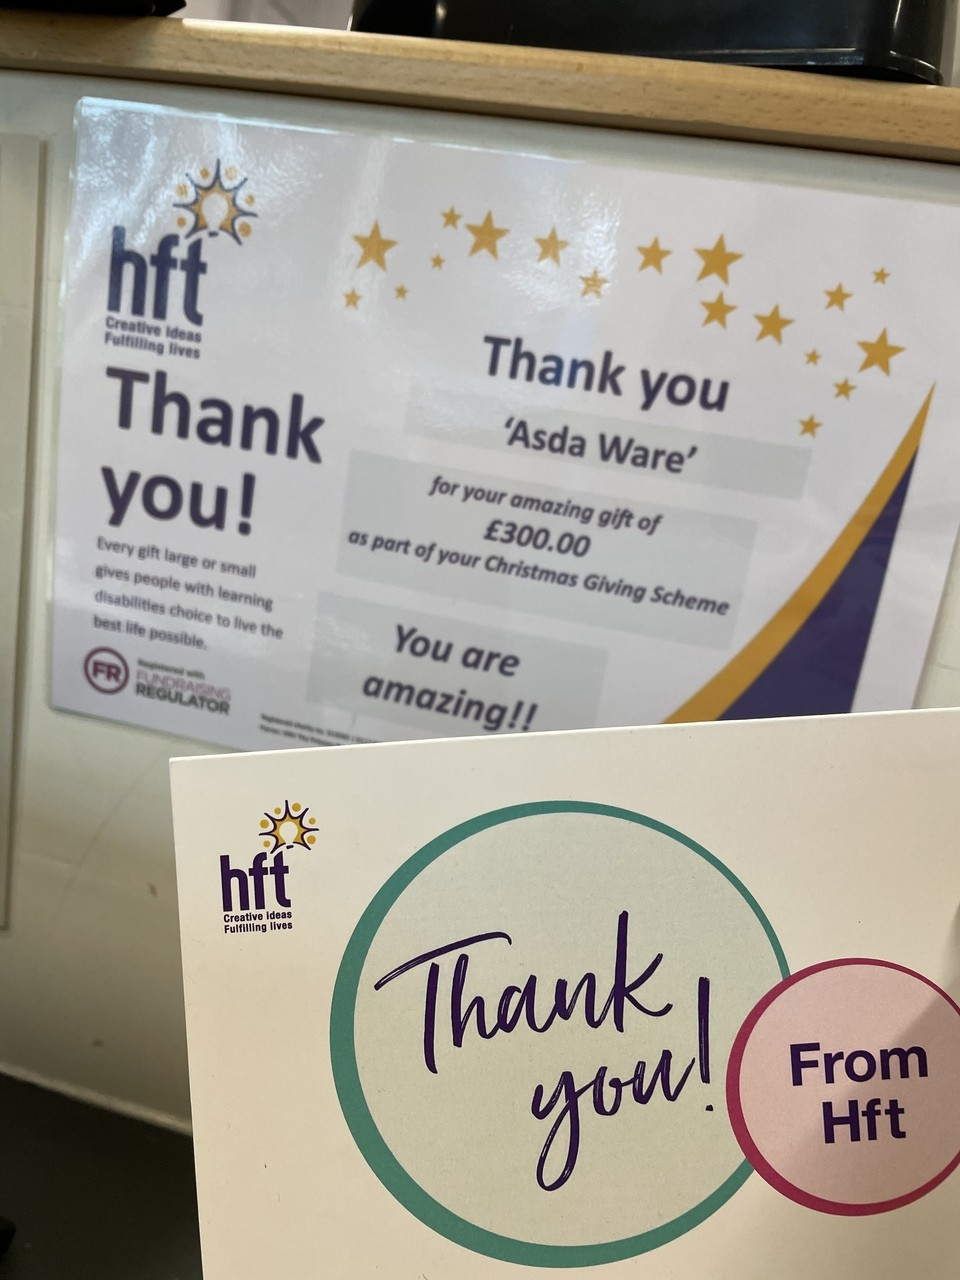 HFT | Asda Ware